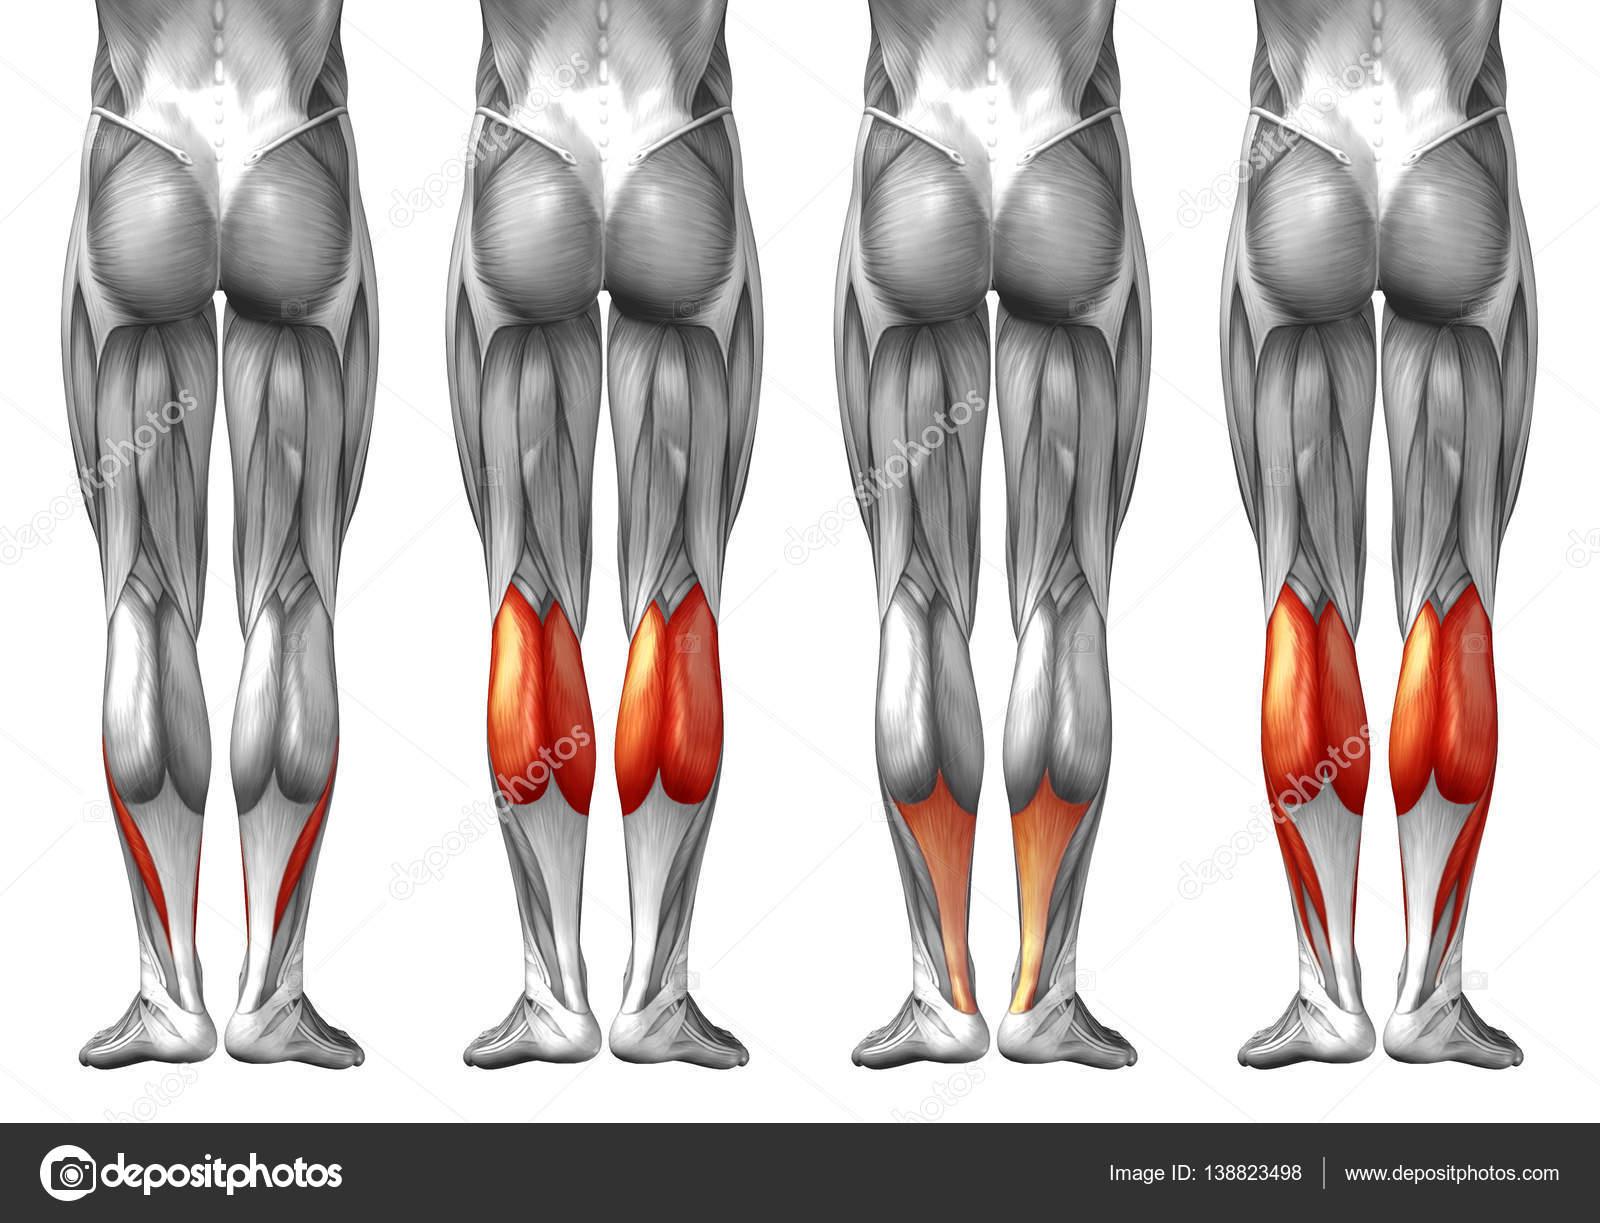 Human Lower Leg Anatomy Stock Photo Design36 138823498